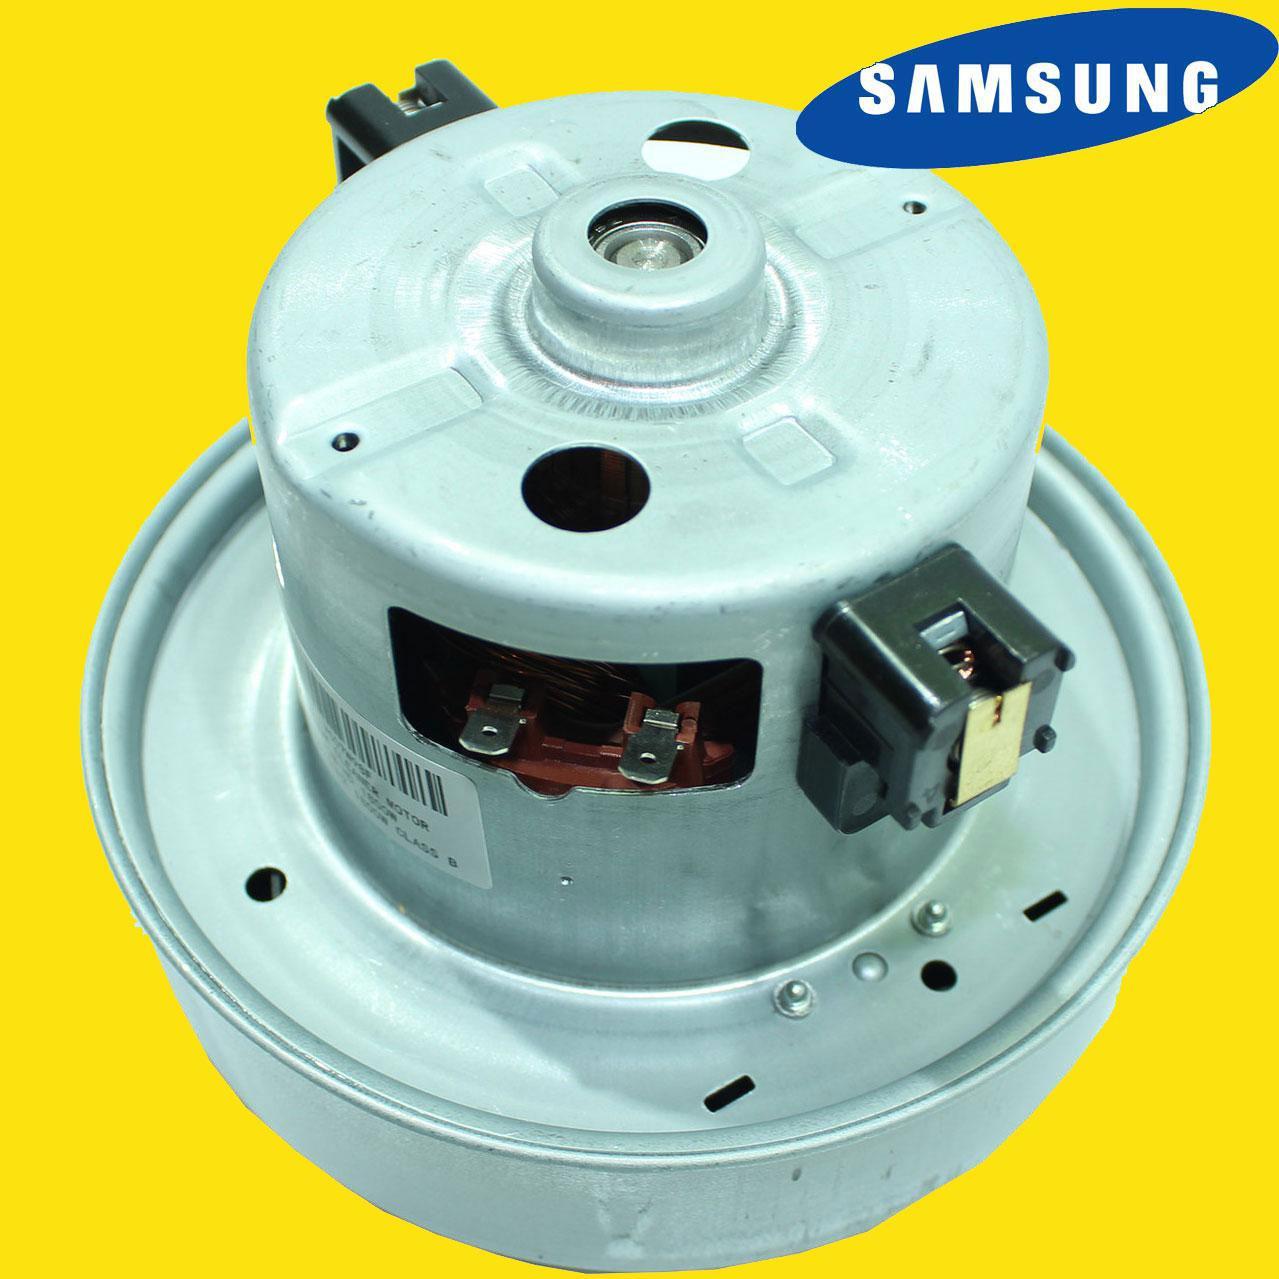 Мотор для пылесоса SAMSUNG 1800W (D=135 mm, H=112 mm)